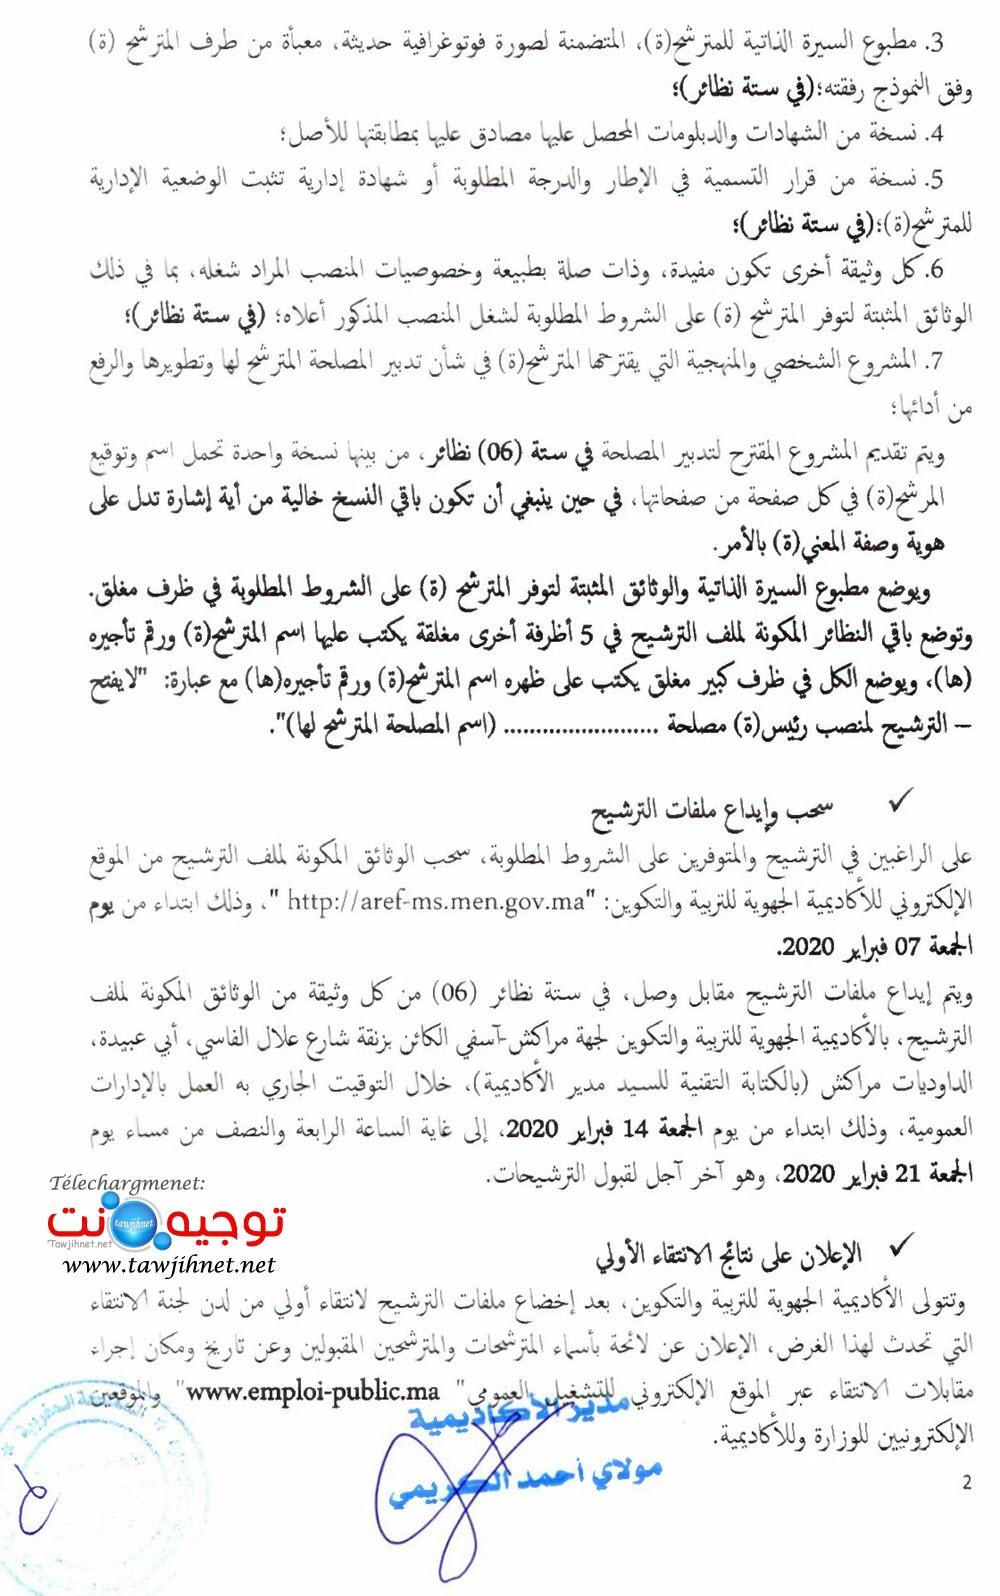 aref-marrakech-safi-poste-responsablité-2020_Page_2.jpg